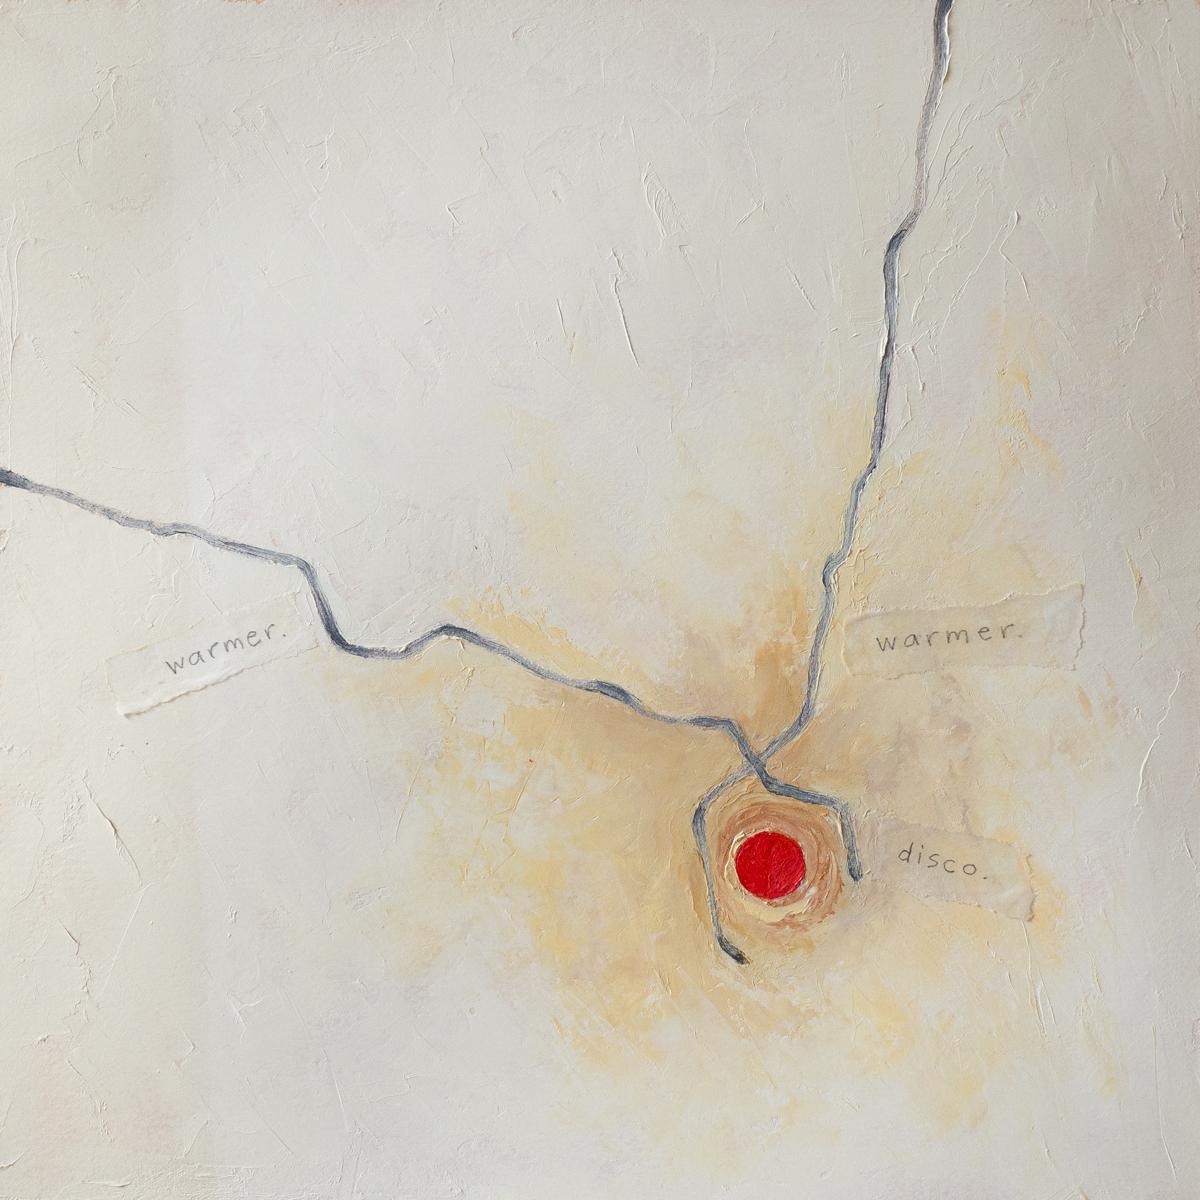 Warmer, Warmer, Disco   oil on watercolour paper, 12.5 x 12.5